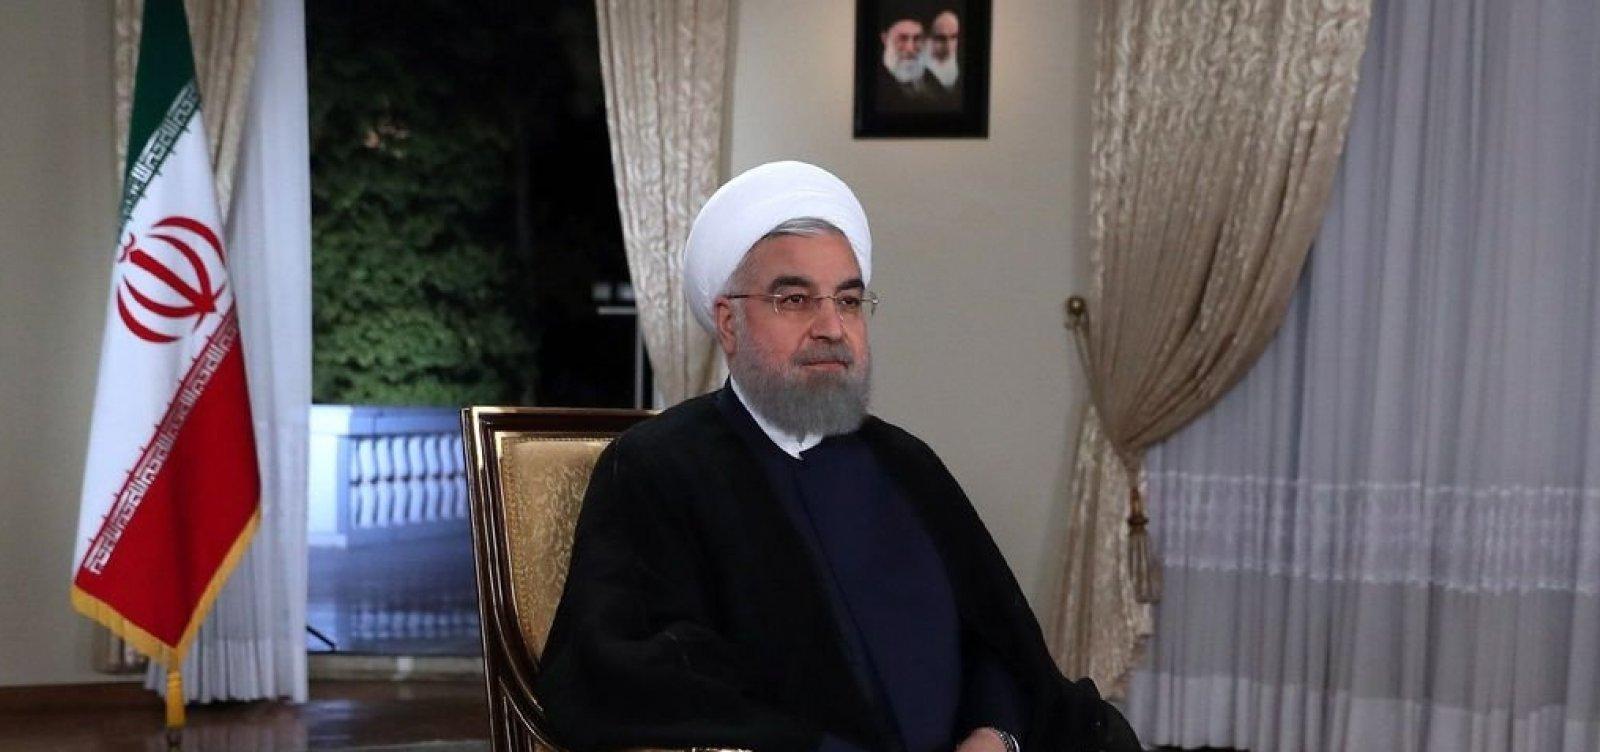 [Países insistem que Irã cumpra acordo nuclear de 2015]